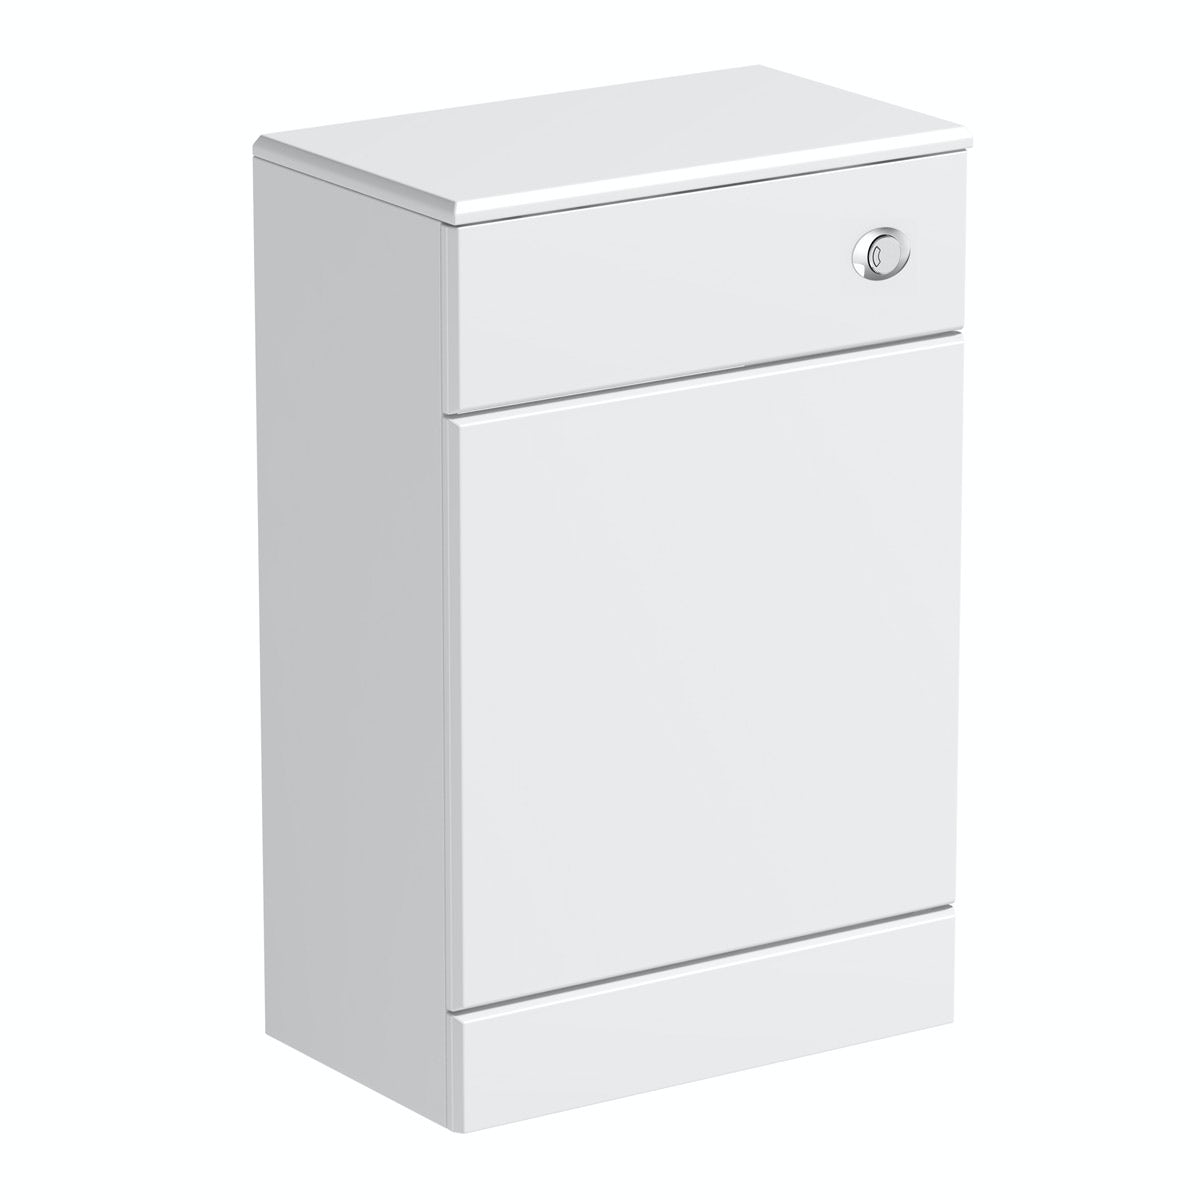 Sienna white slimline back to wall toilet unit